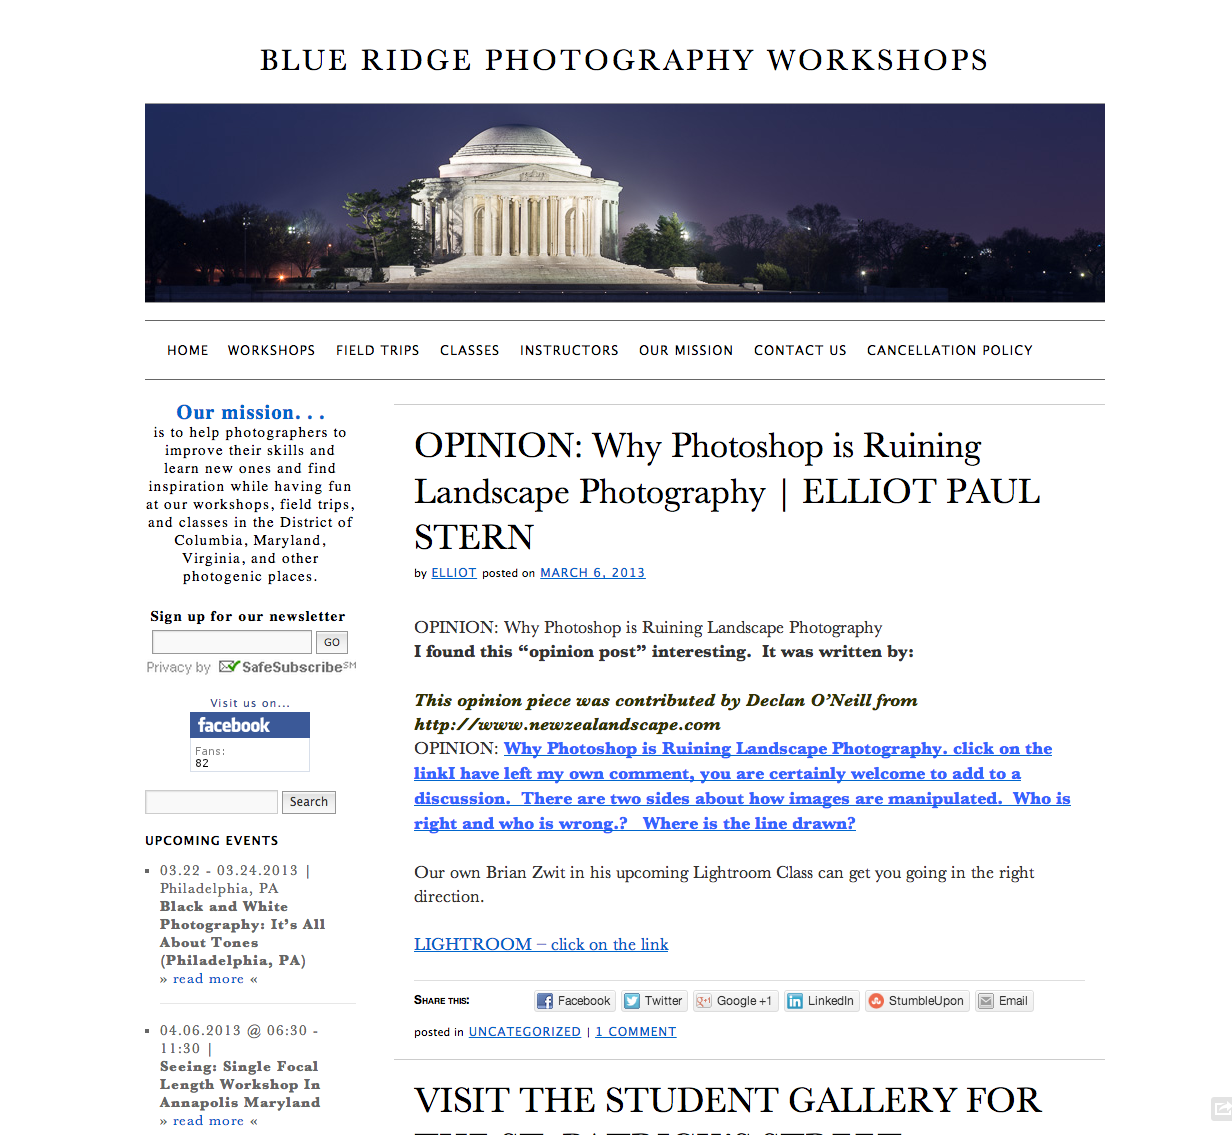 Blue Ridge Photography Workshops